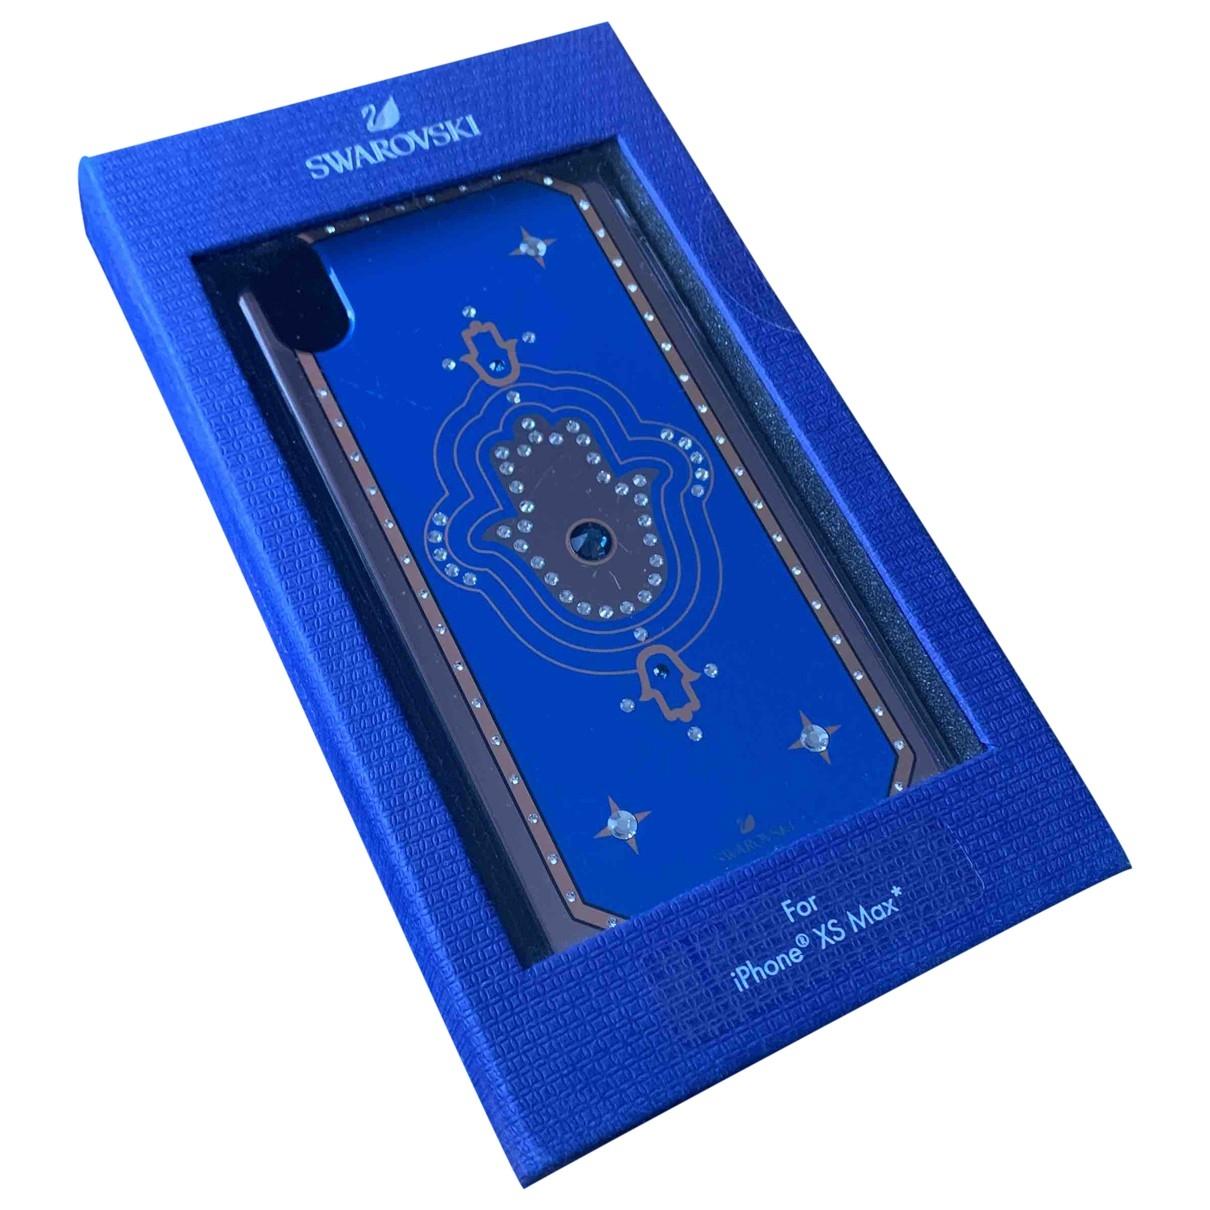 Swarovski \N Blue Accessories for Life & Living \N